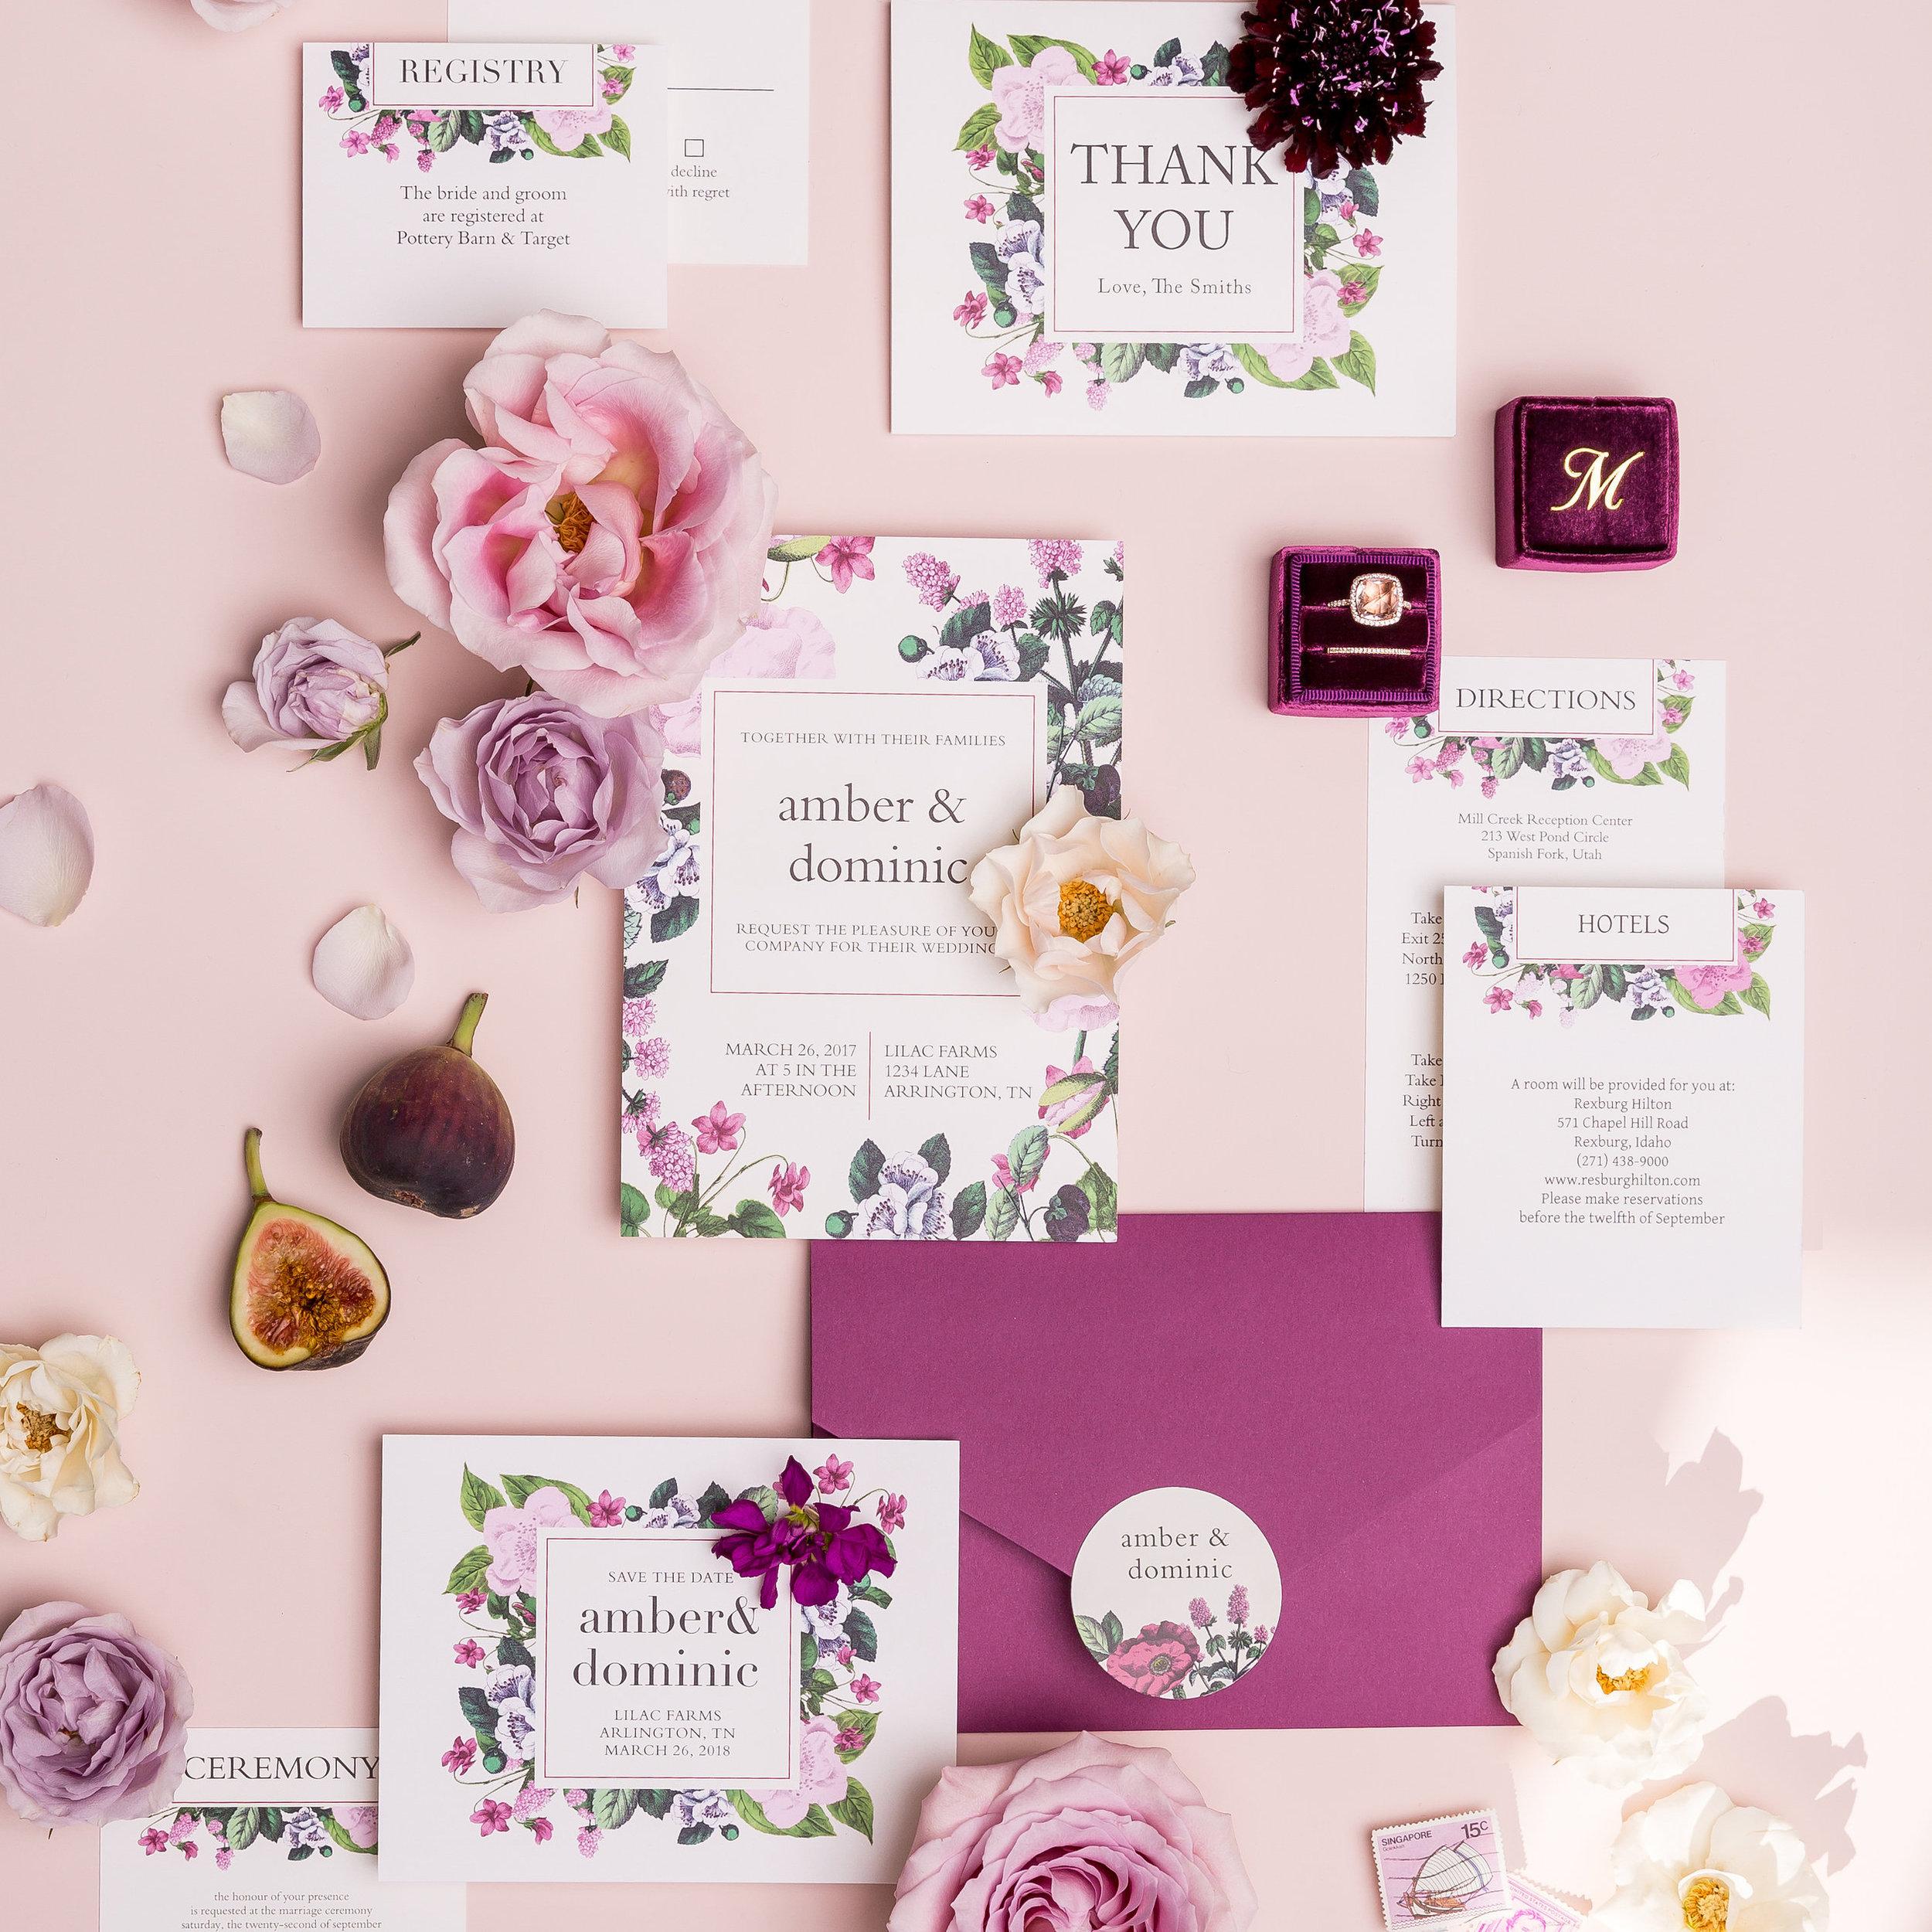 Boston Wedding Photographer, Basic Invite, Wedding Invitations